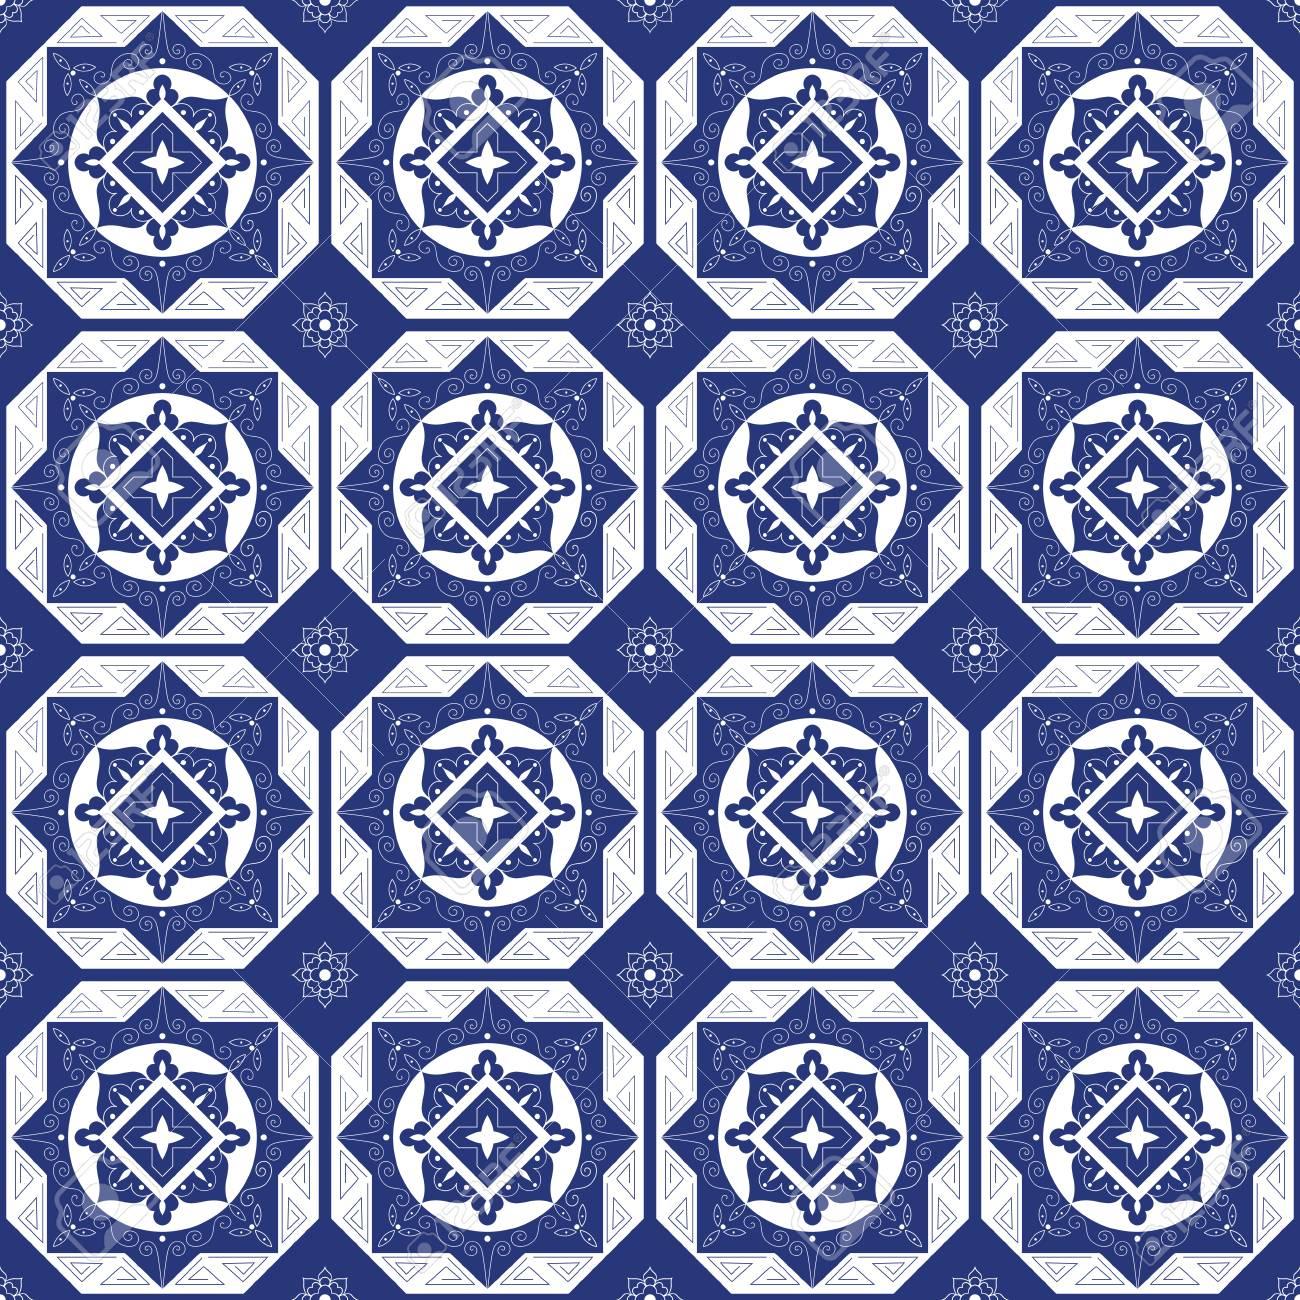 holland blue white porcelain tile floor mosaic tiled pattern